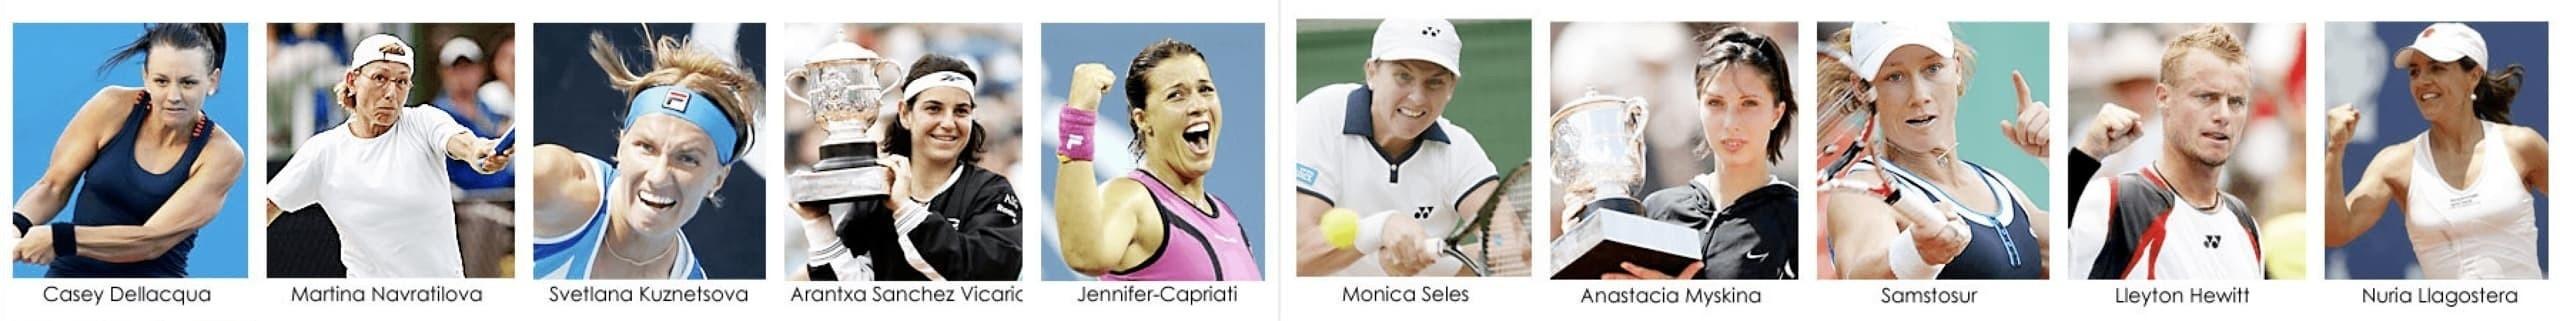 pro-tennis-players